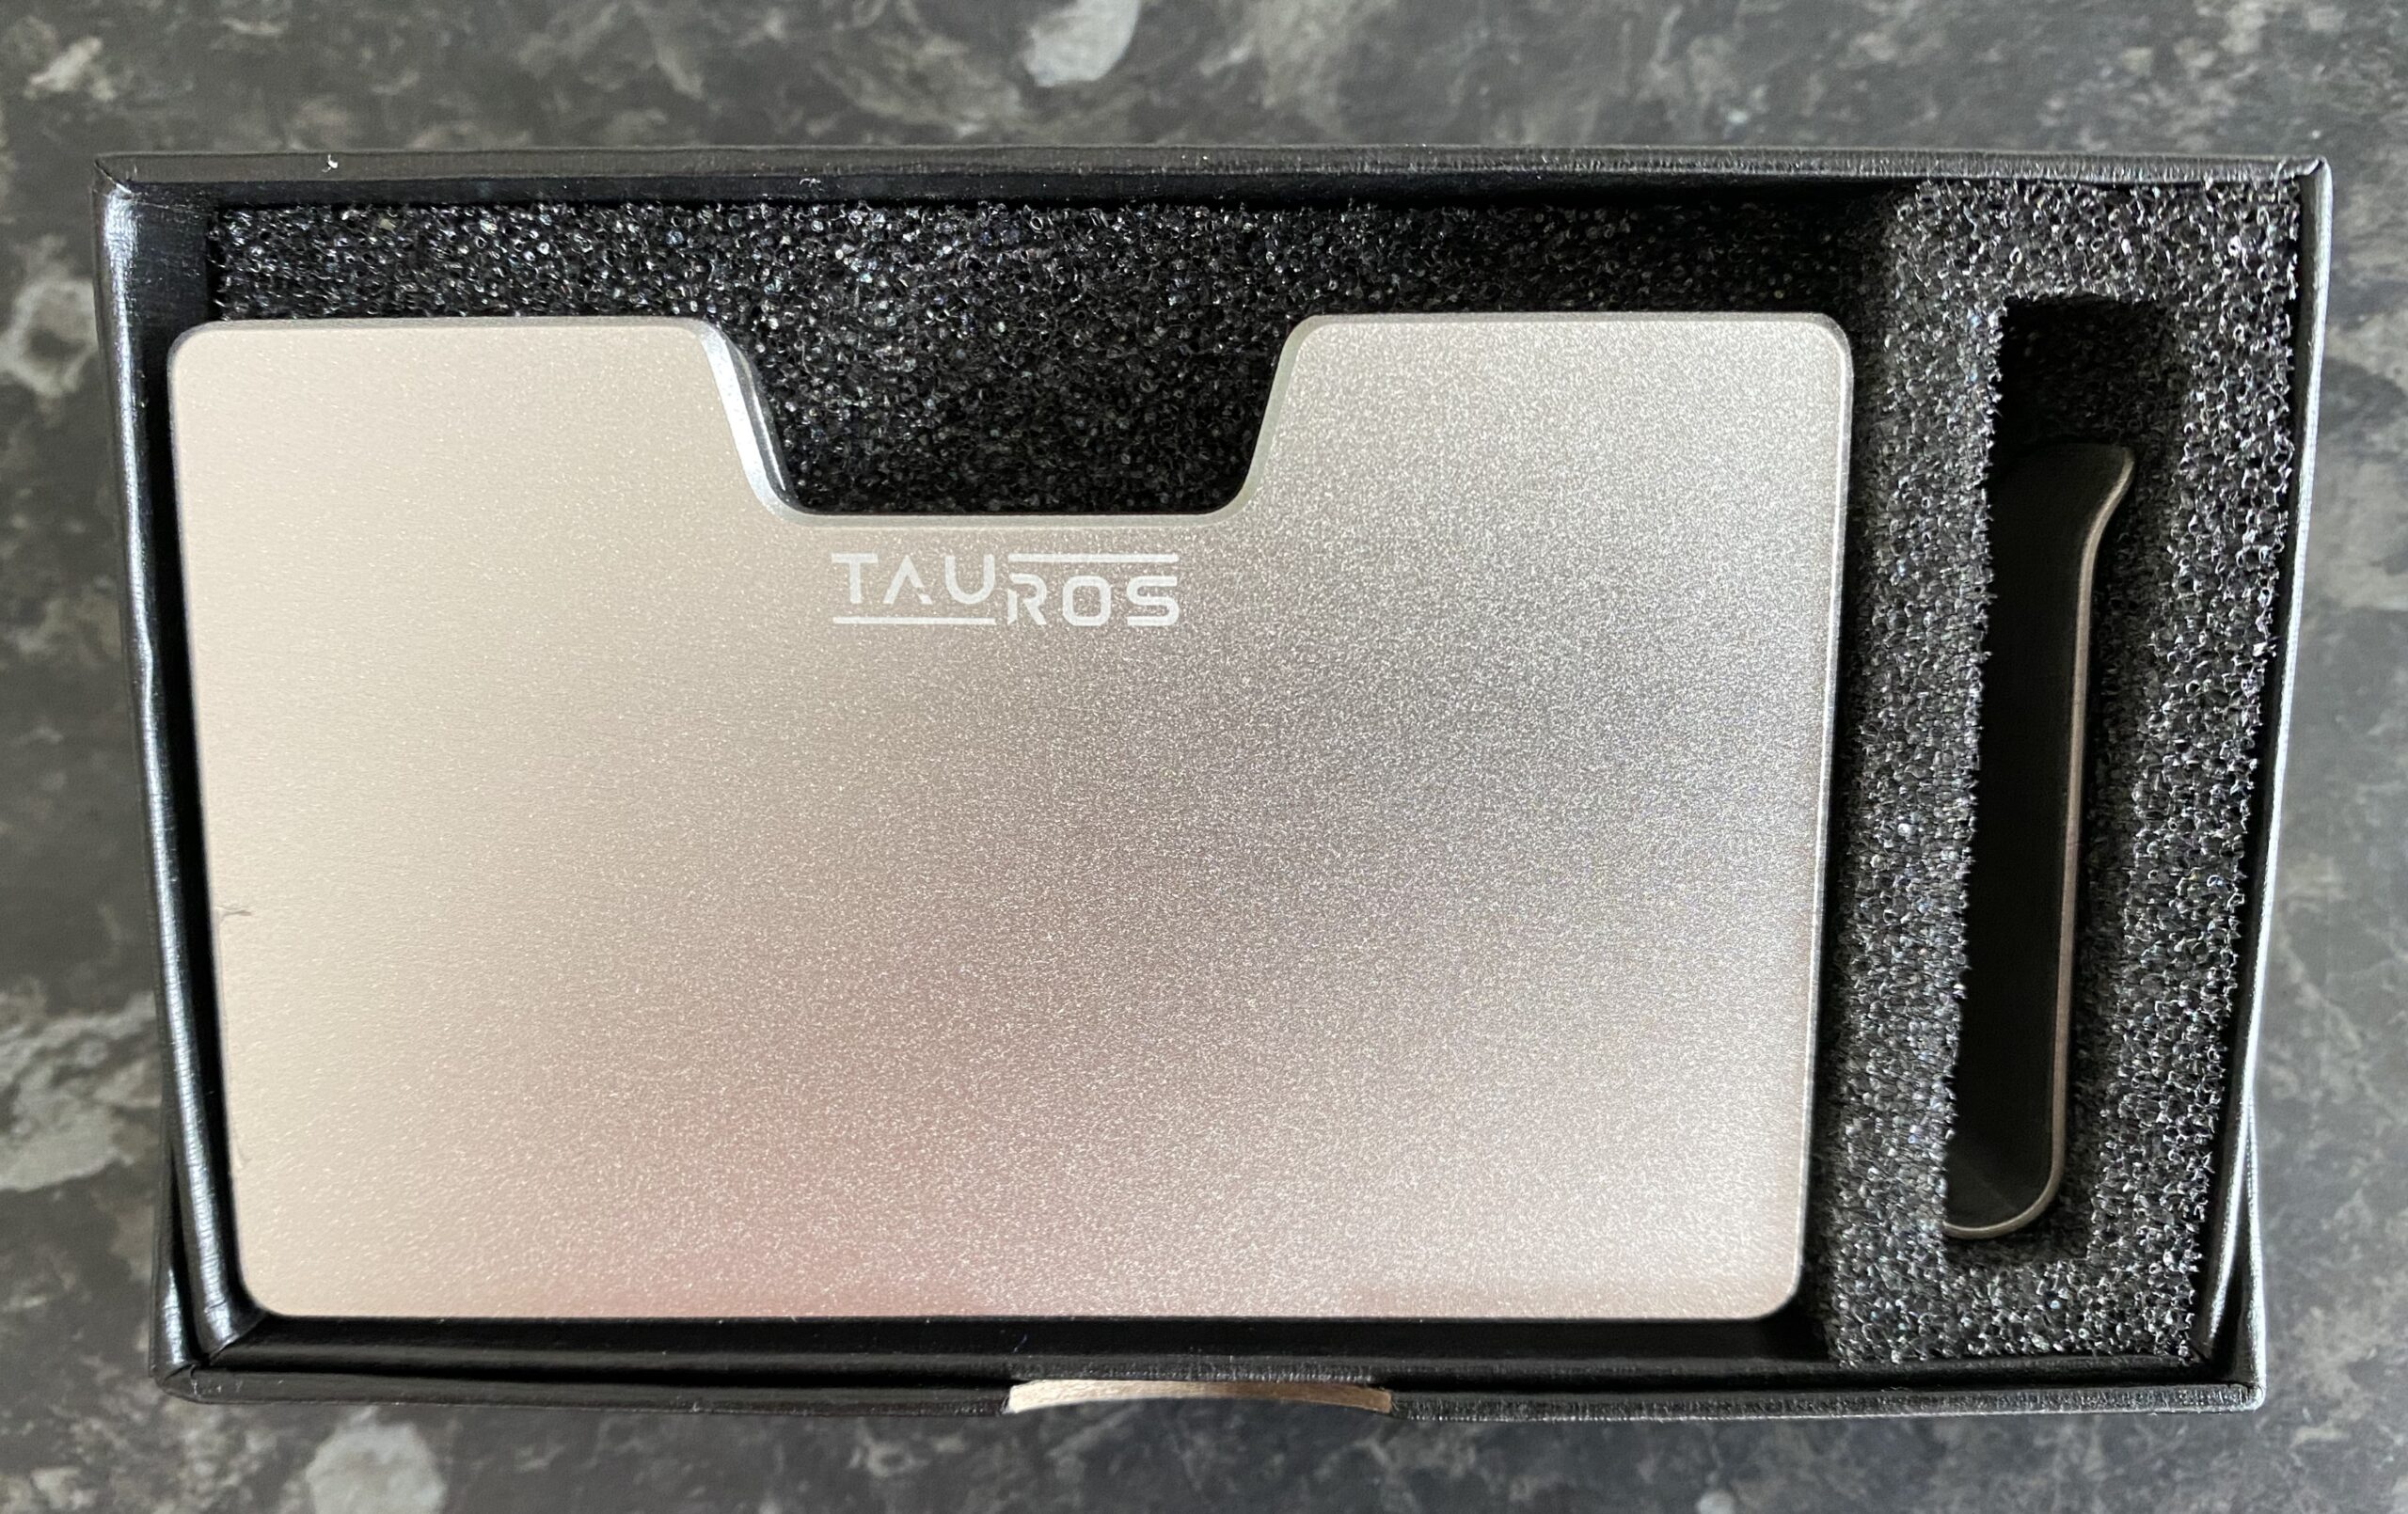 Tauros wallet